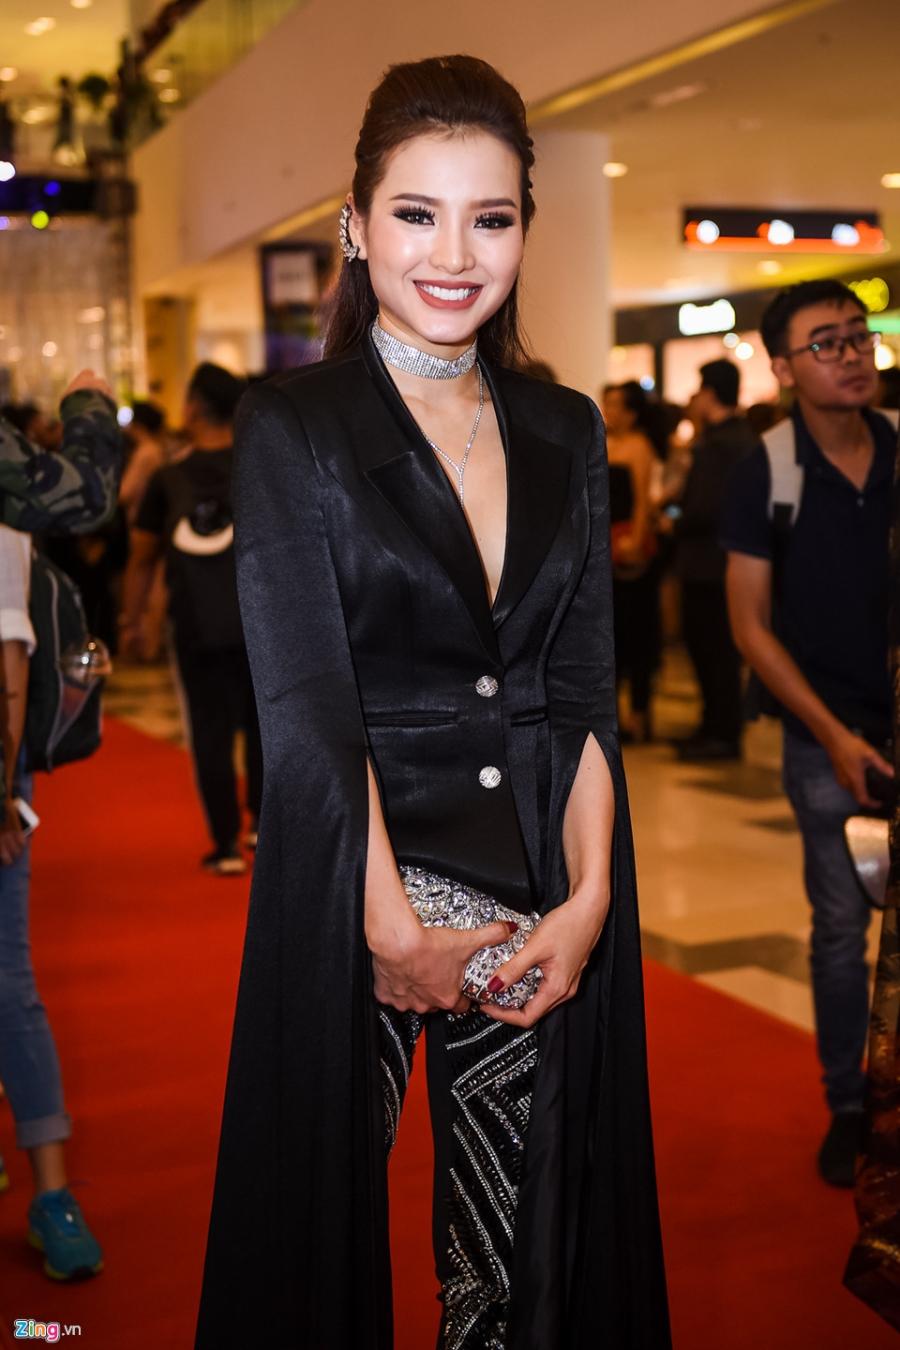 Phuong Trinh Jolie: 'Toi yeu va bo nhieu dan ong de tra thu cho me' hinh anh 1